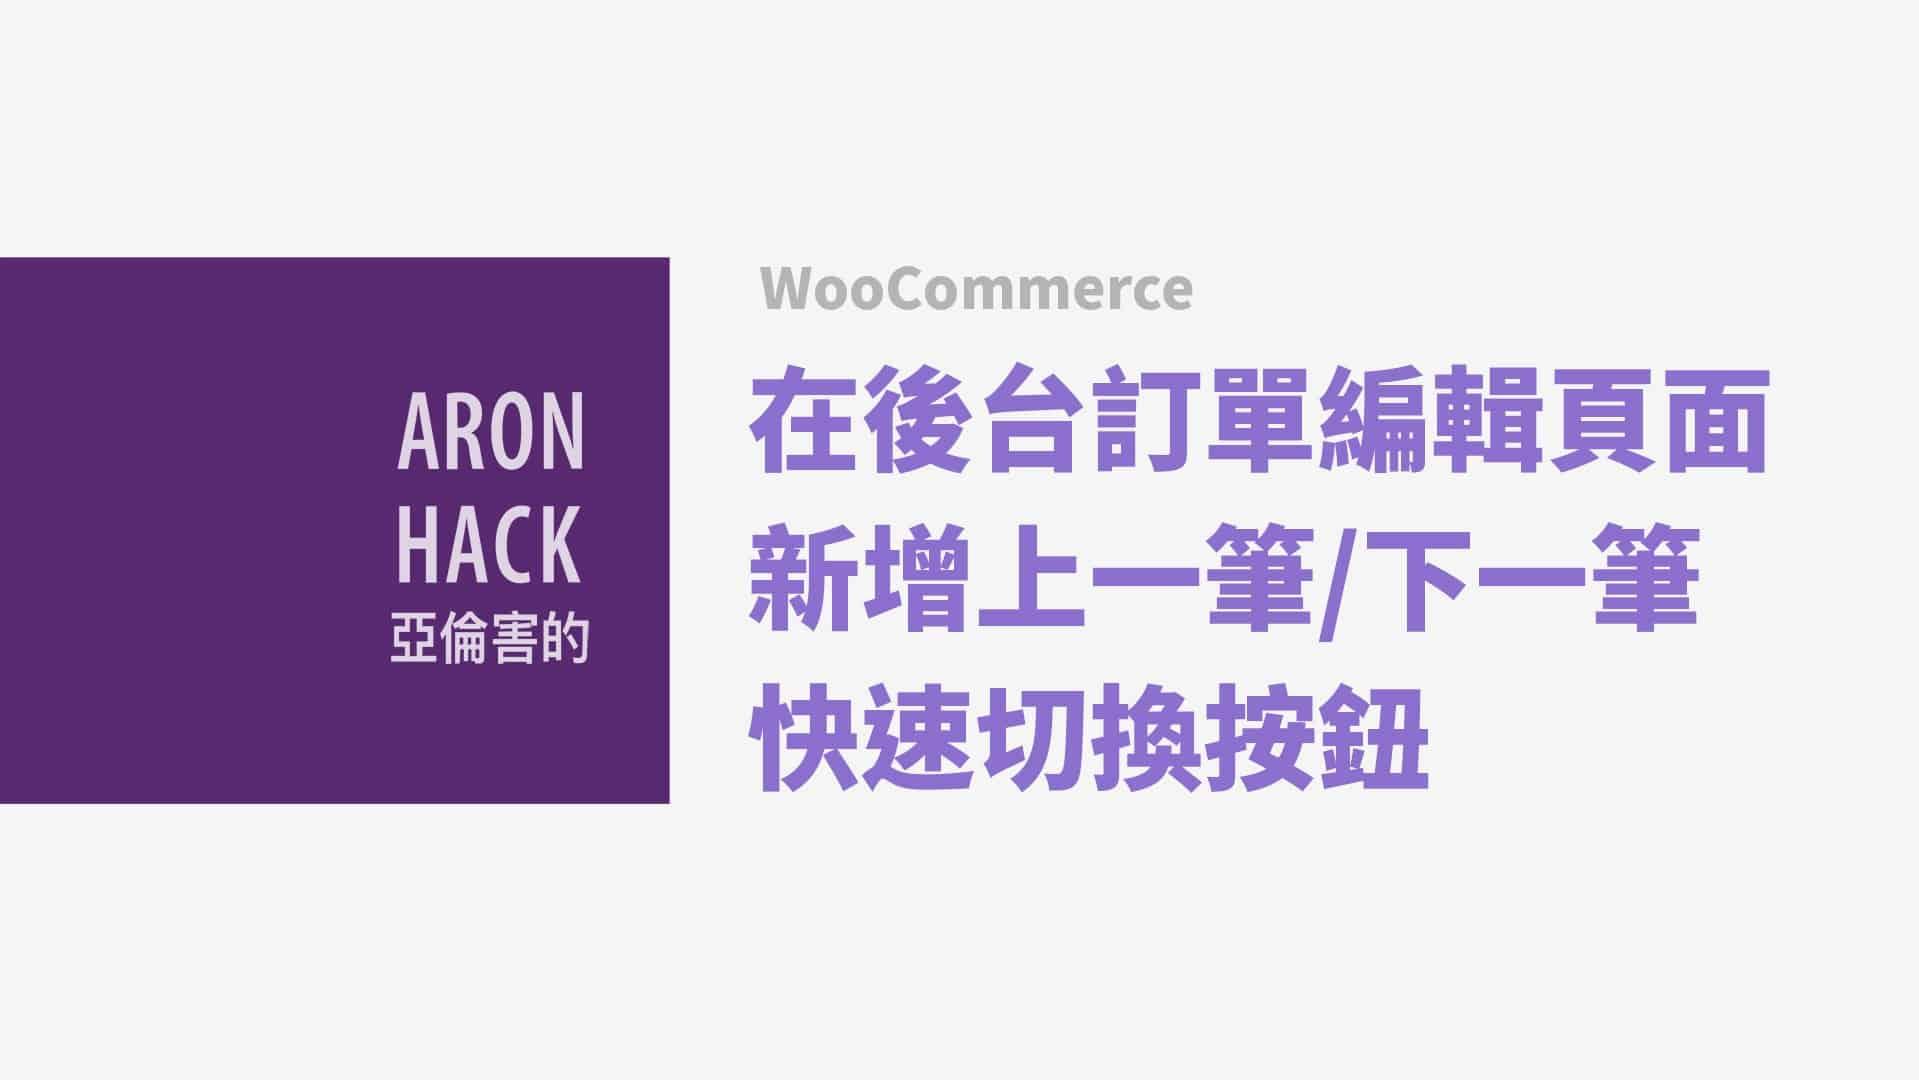 woocommerce在後台訂單編輯頁面新增上一筆下一筆快速切換按鈕